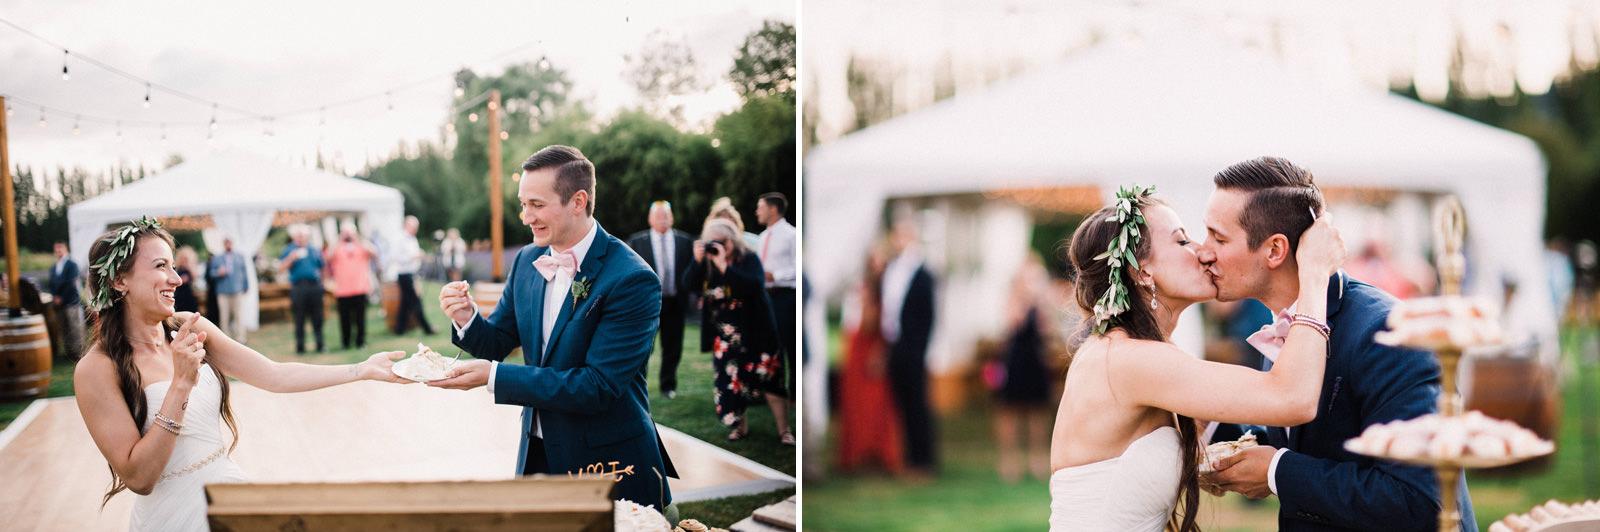 075-woodinville-lavendar-farm-wedding-with-golden-glowy-photos.jpg